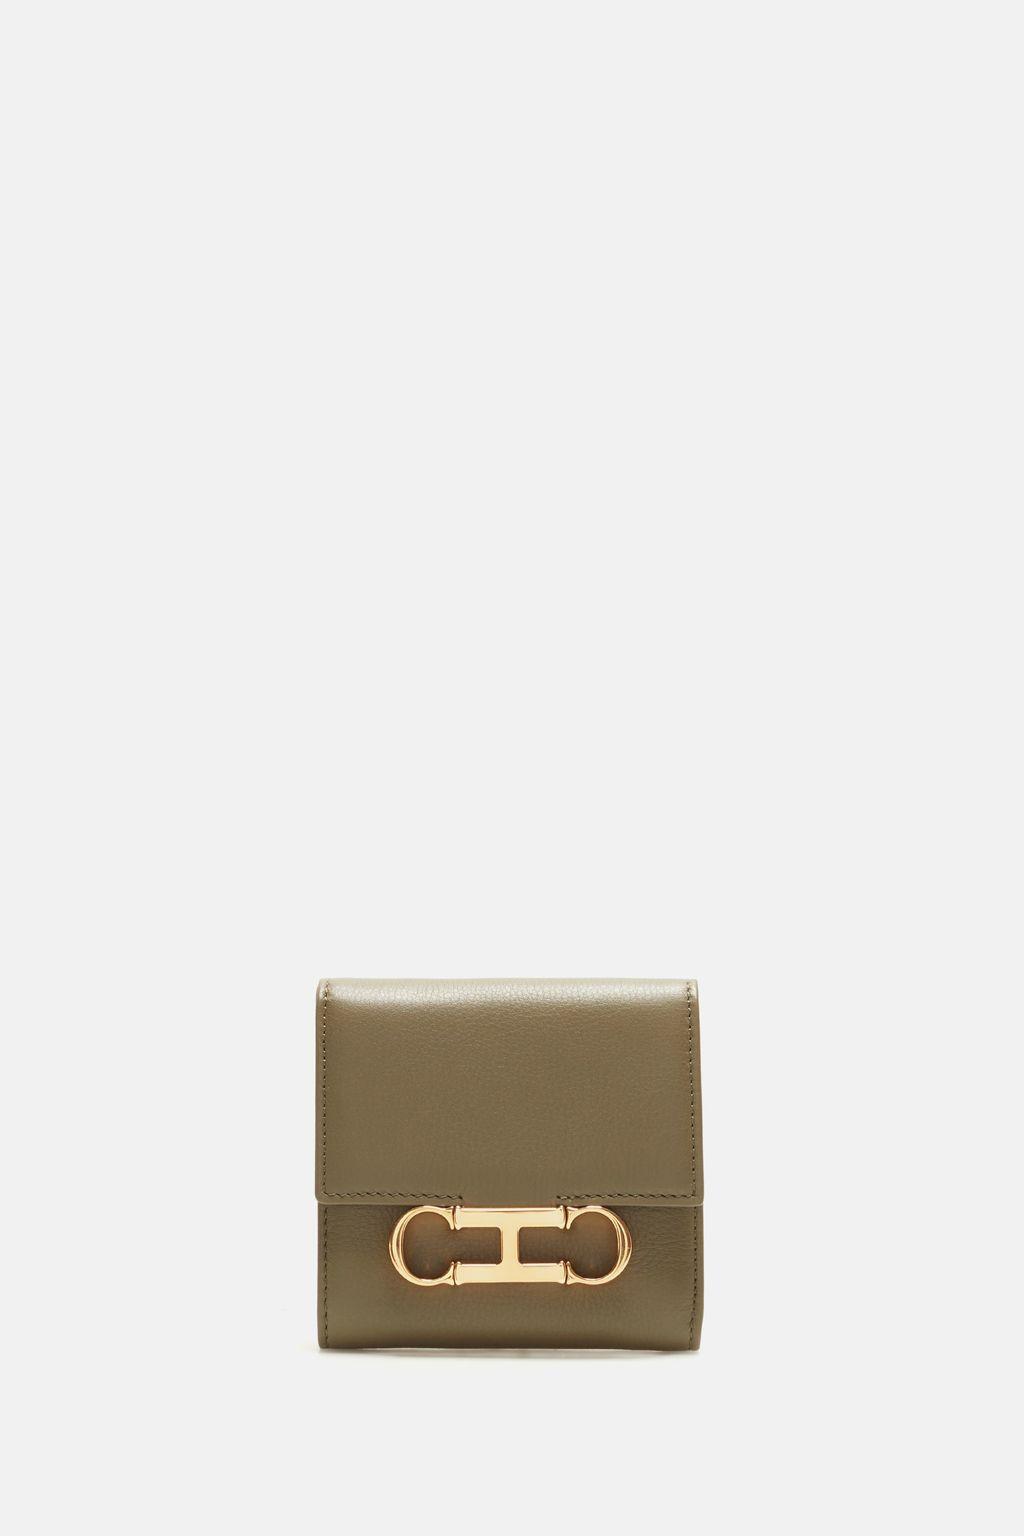 Initials Insignia | Japanese flap wallet